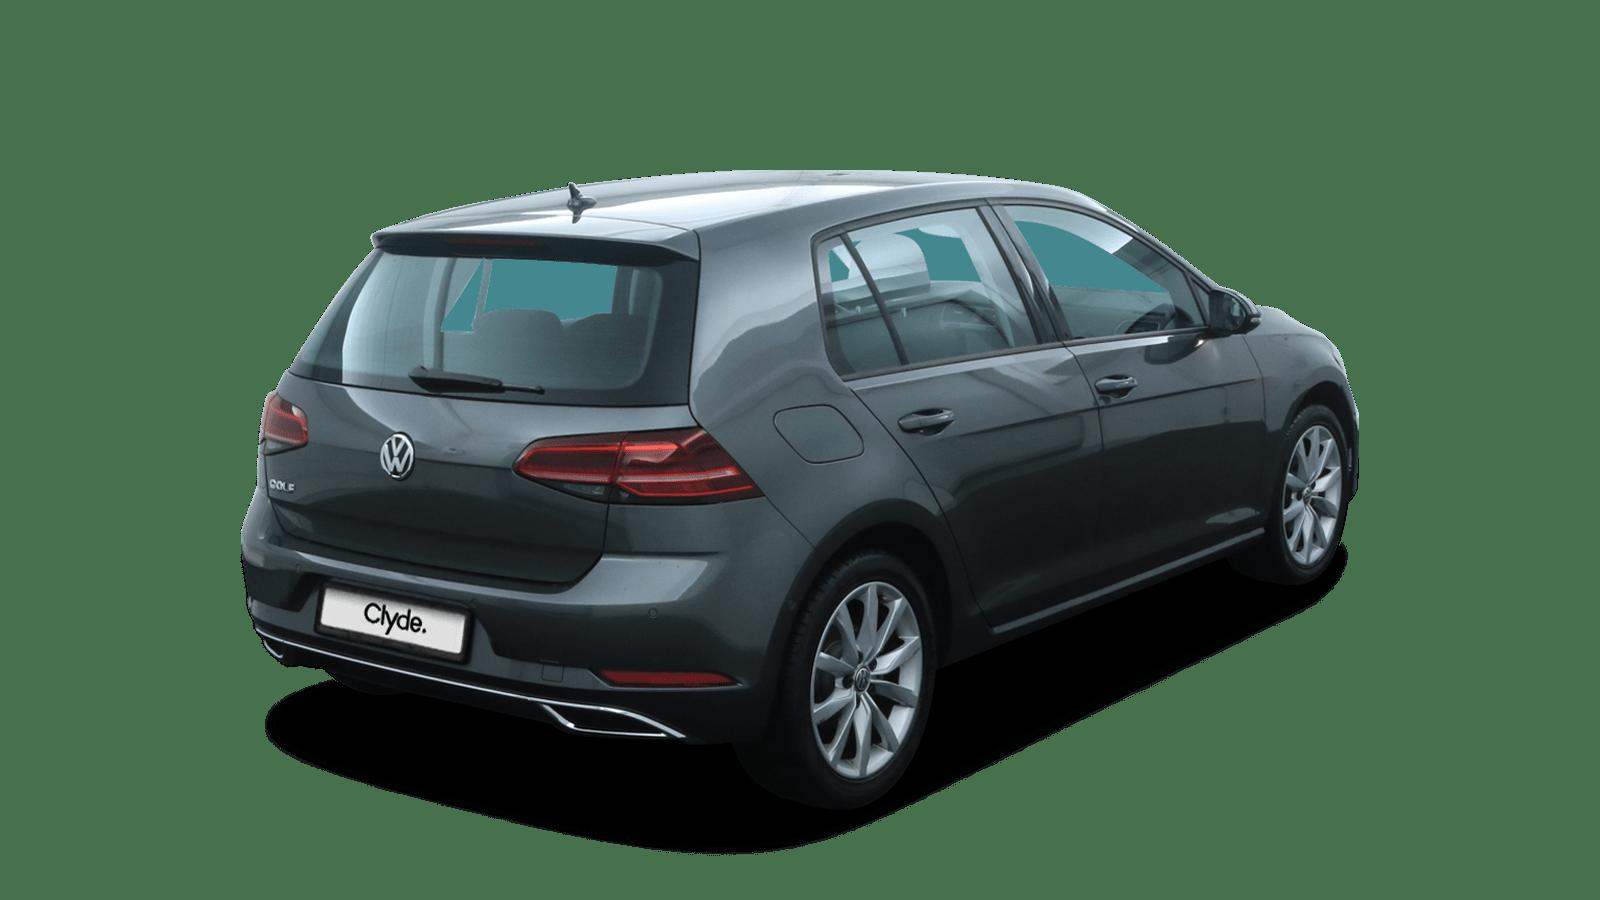 VW Golf Grey back - Clyde car subscription